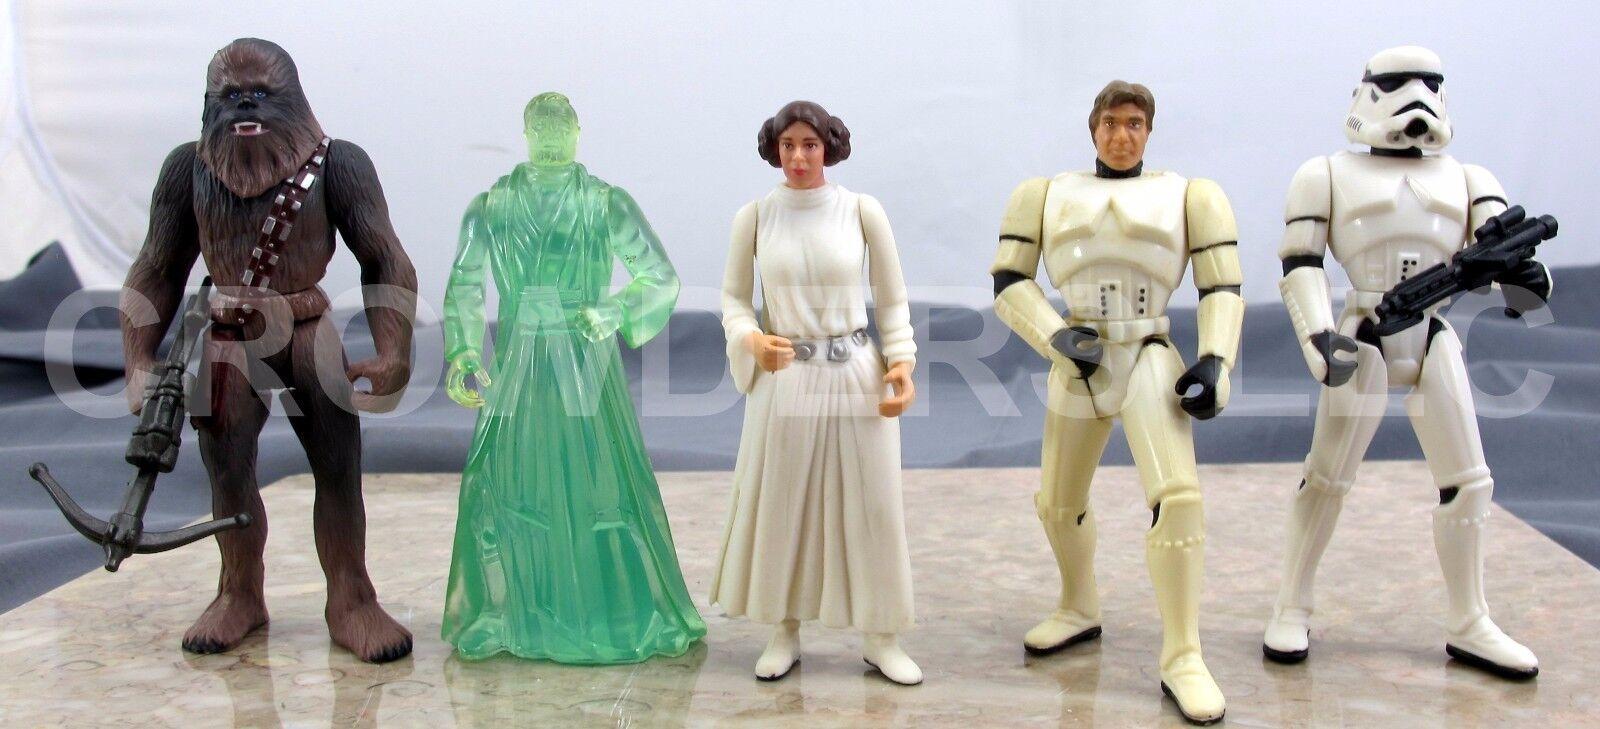 Star Wars PotF Stormtrooper Luke & Han Solo Chewbacca Princess Leia & Obi Kenobi